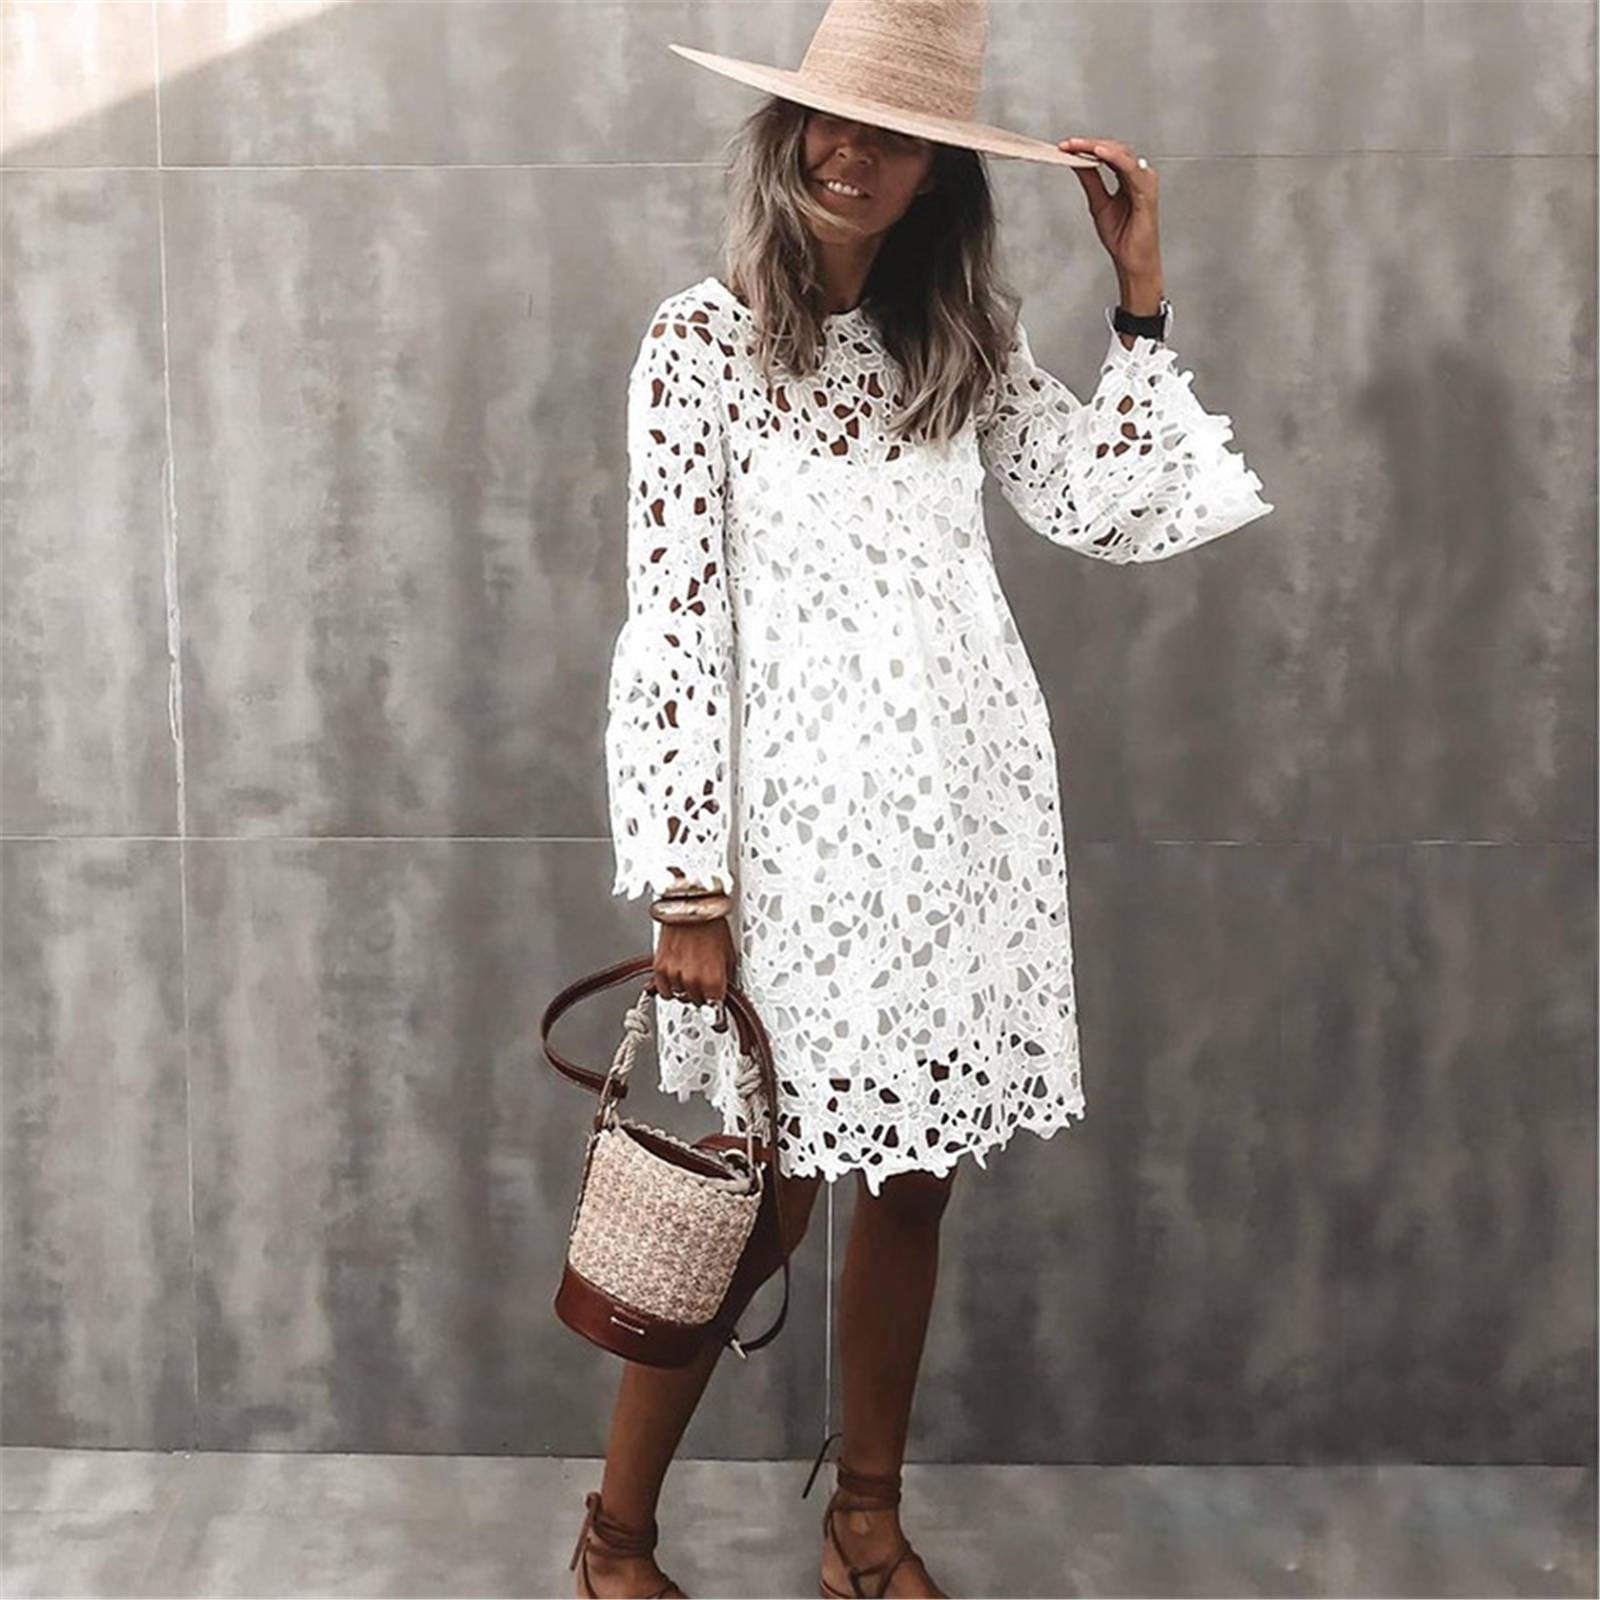 4# Summer Dress 2021 Round Neck Lace Trumpet Sleeve Ruffle Dress Long Sleeve Above Knee Mini Dress Robe Femme Платье Летнее